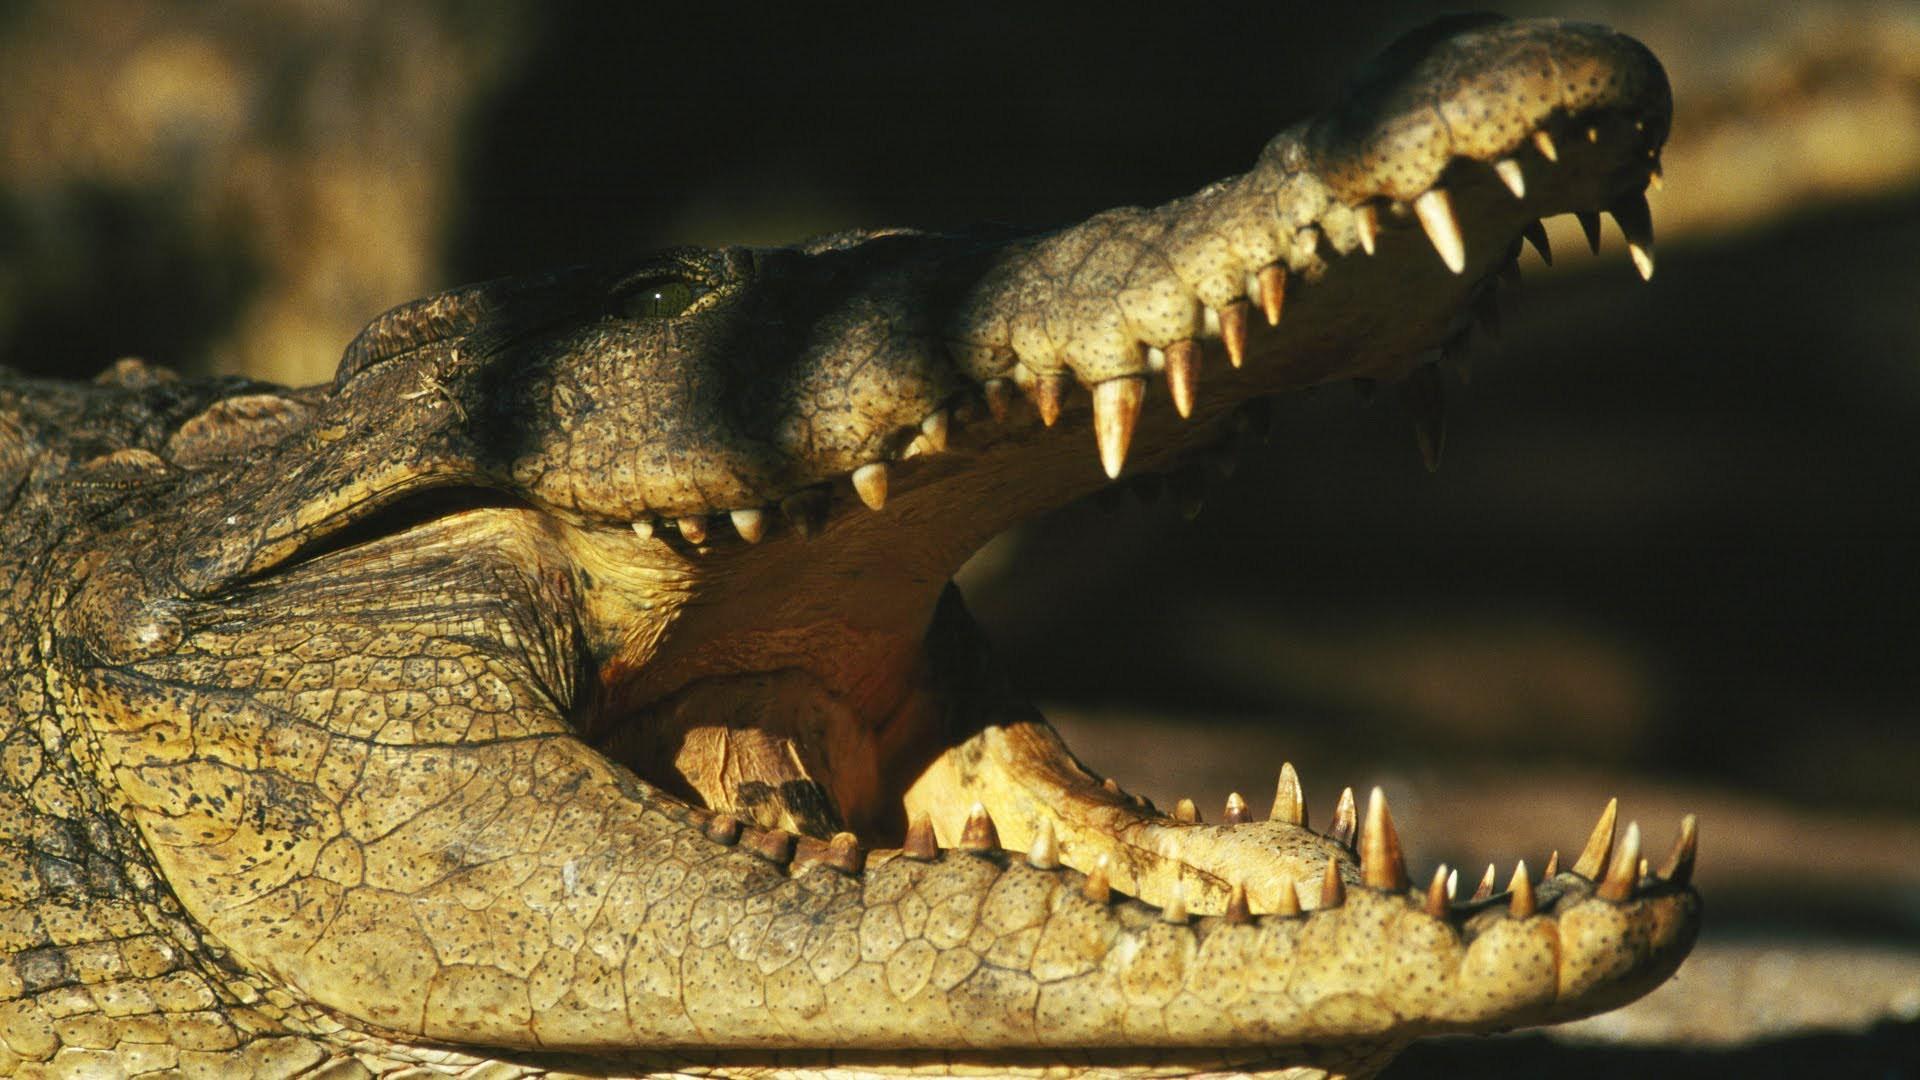 Alligator Desktop